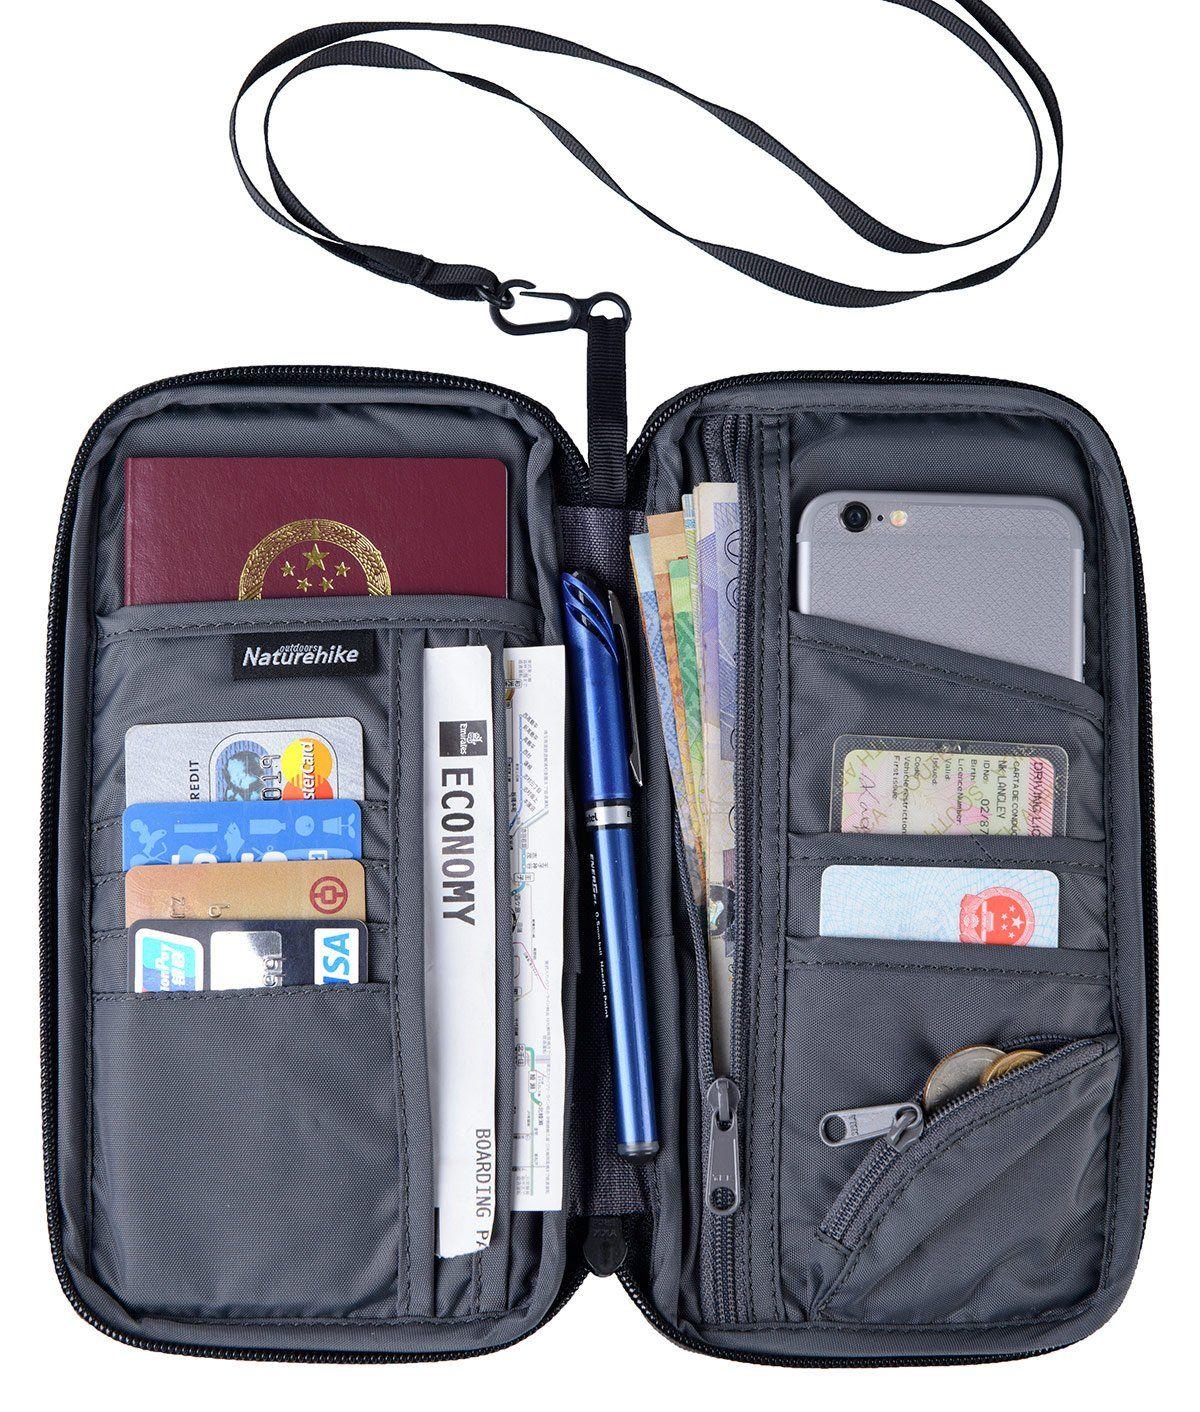 fd6eb03f950291 Naturehike Multifunctional Travel Wallet Passport Holder for Card Money  Ticket Mobile (Grey): Amazon.co.uk: Luggage